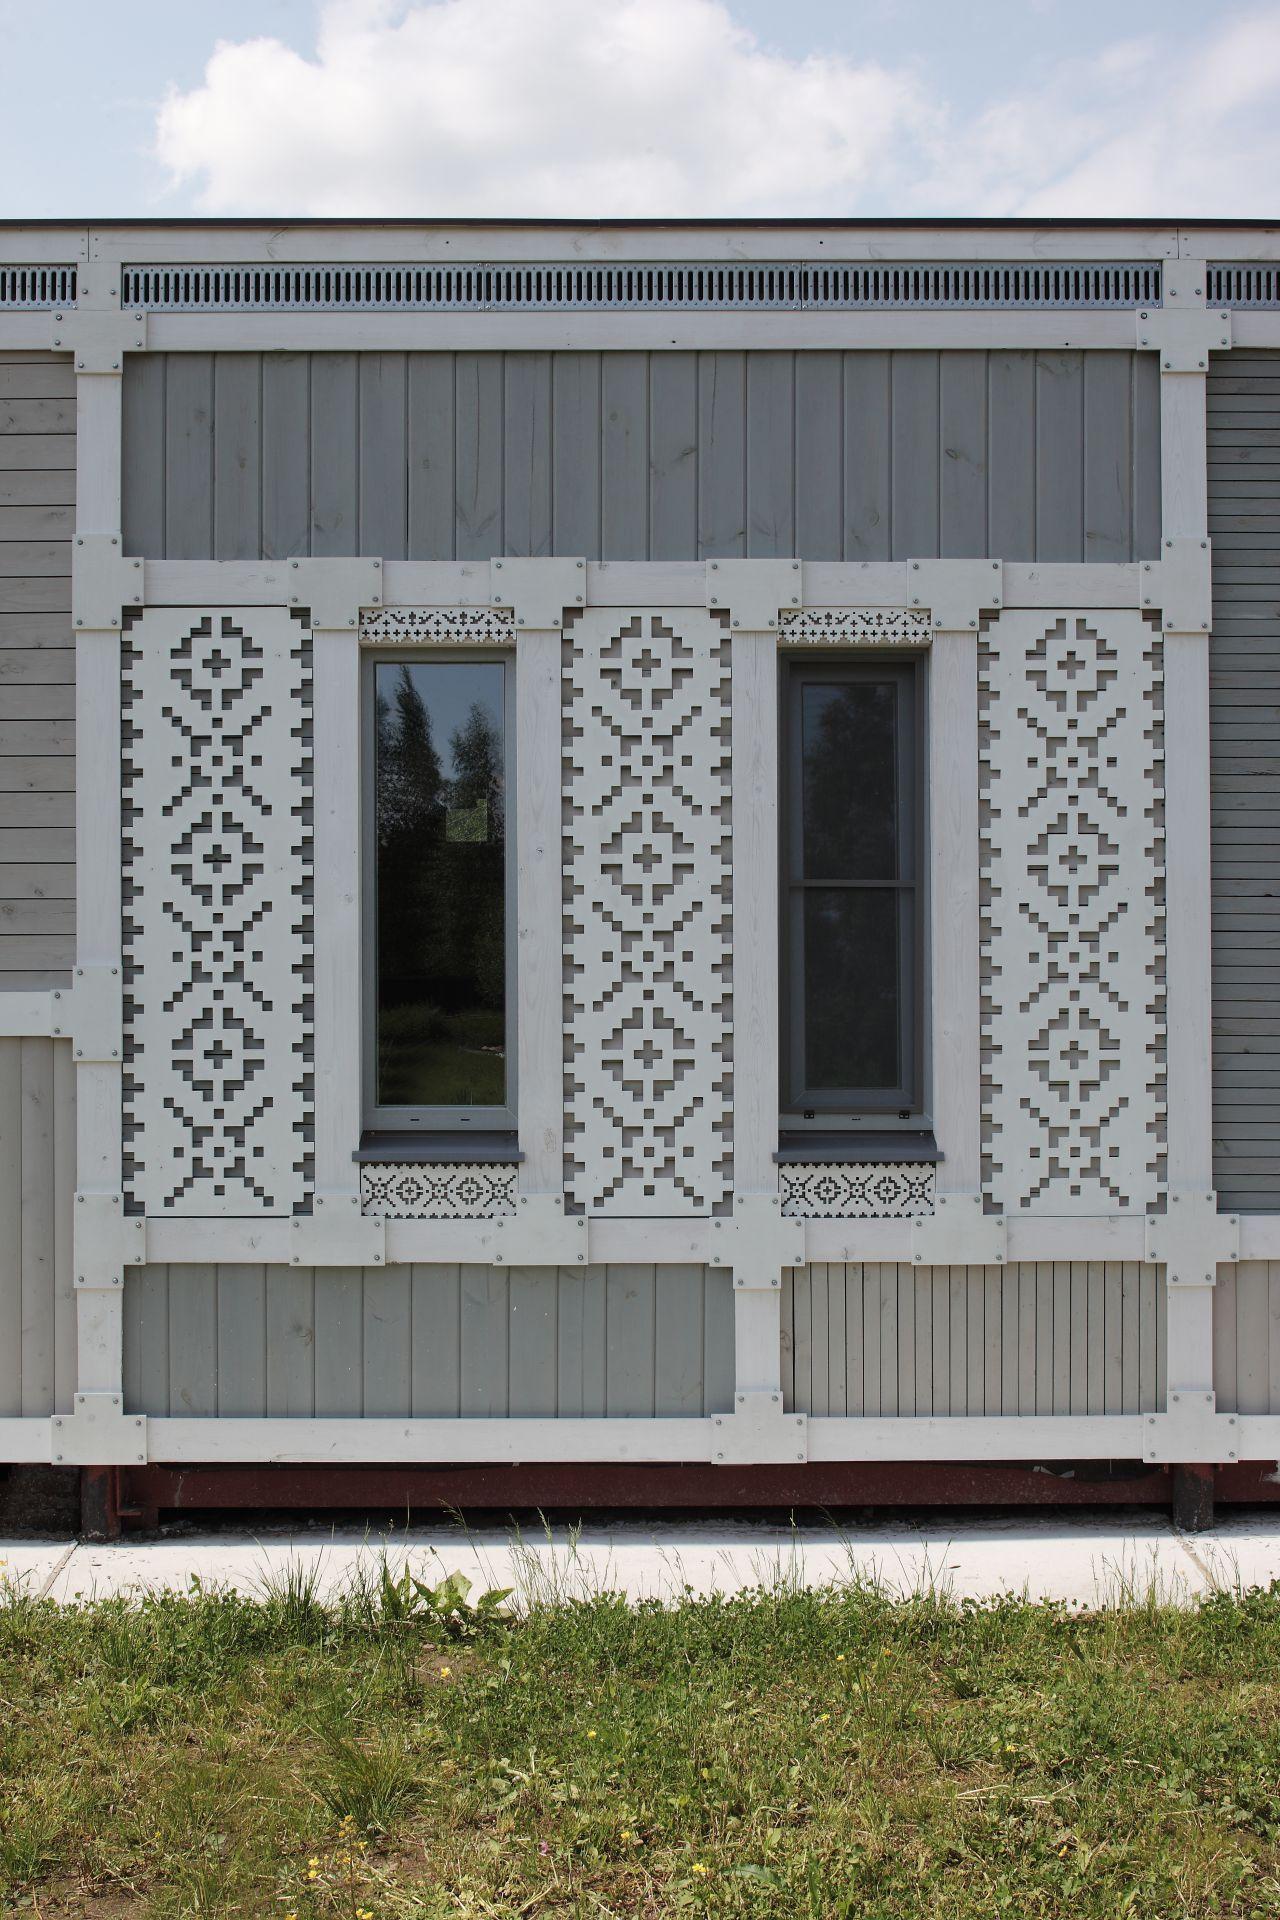 51ef0db6e8e44ea5b700008a_deco-pattern-house-peter-kostelov_kostelov_deco_pattern_facade_06